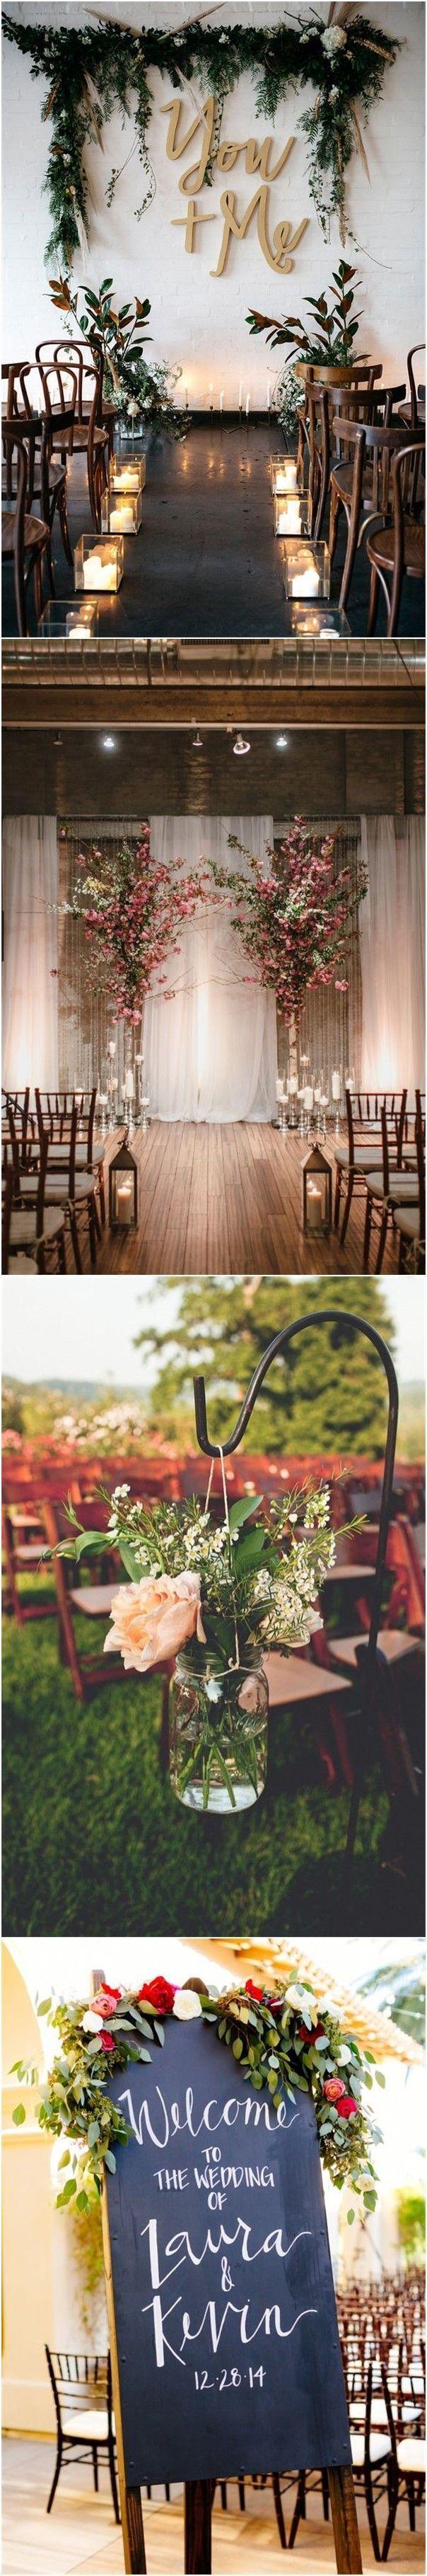 Wedding lawn decoration ideas   Rustic Outdoor Wedding Ceremony Decorations Ideas in   Rough